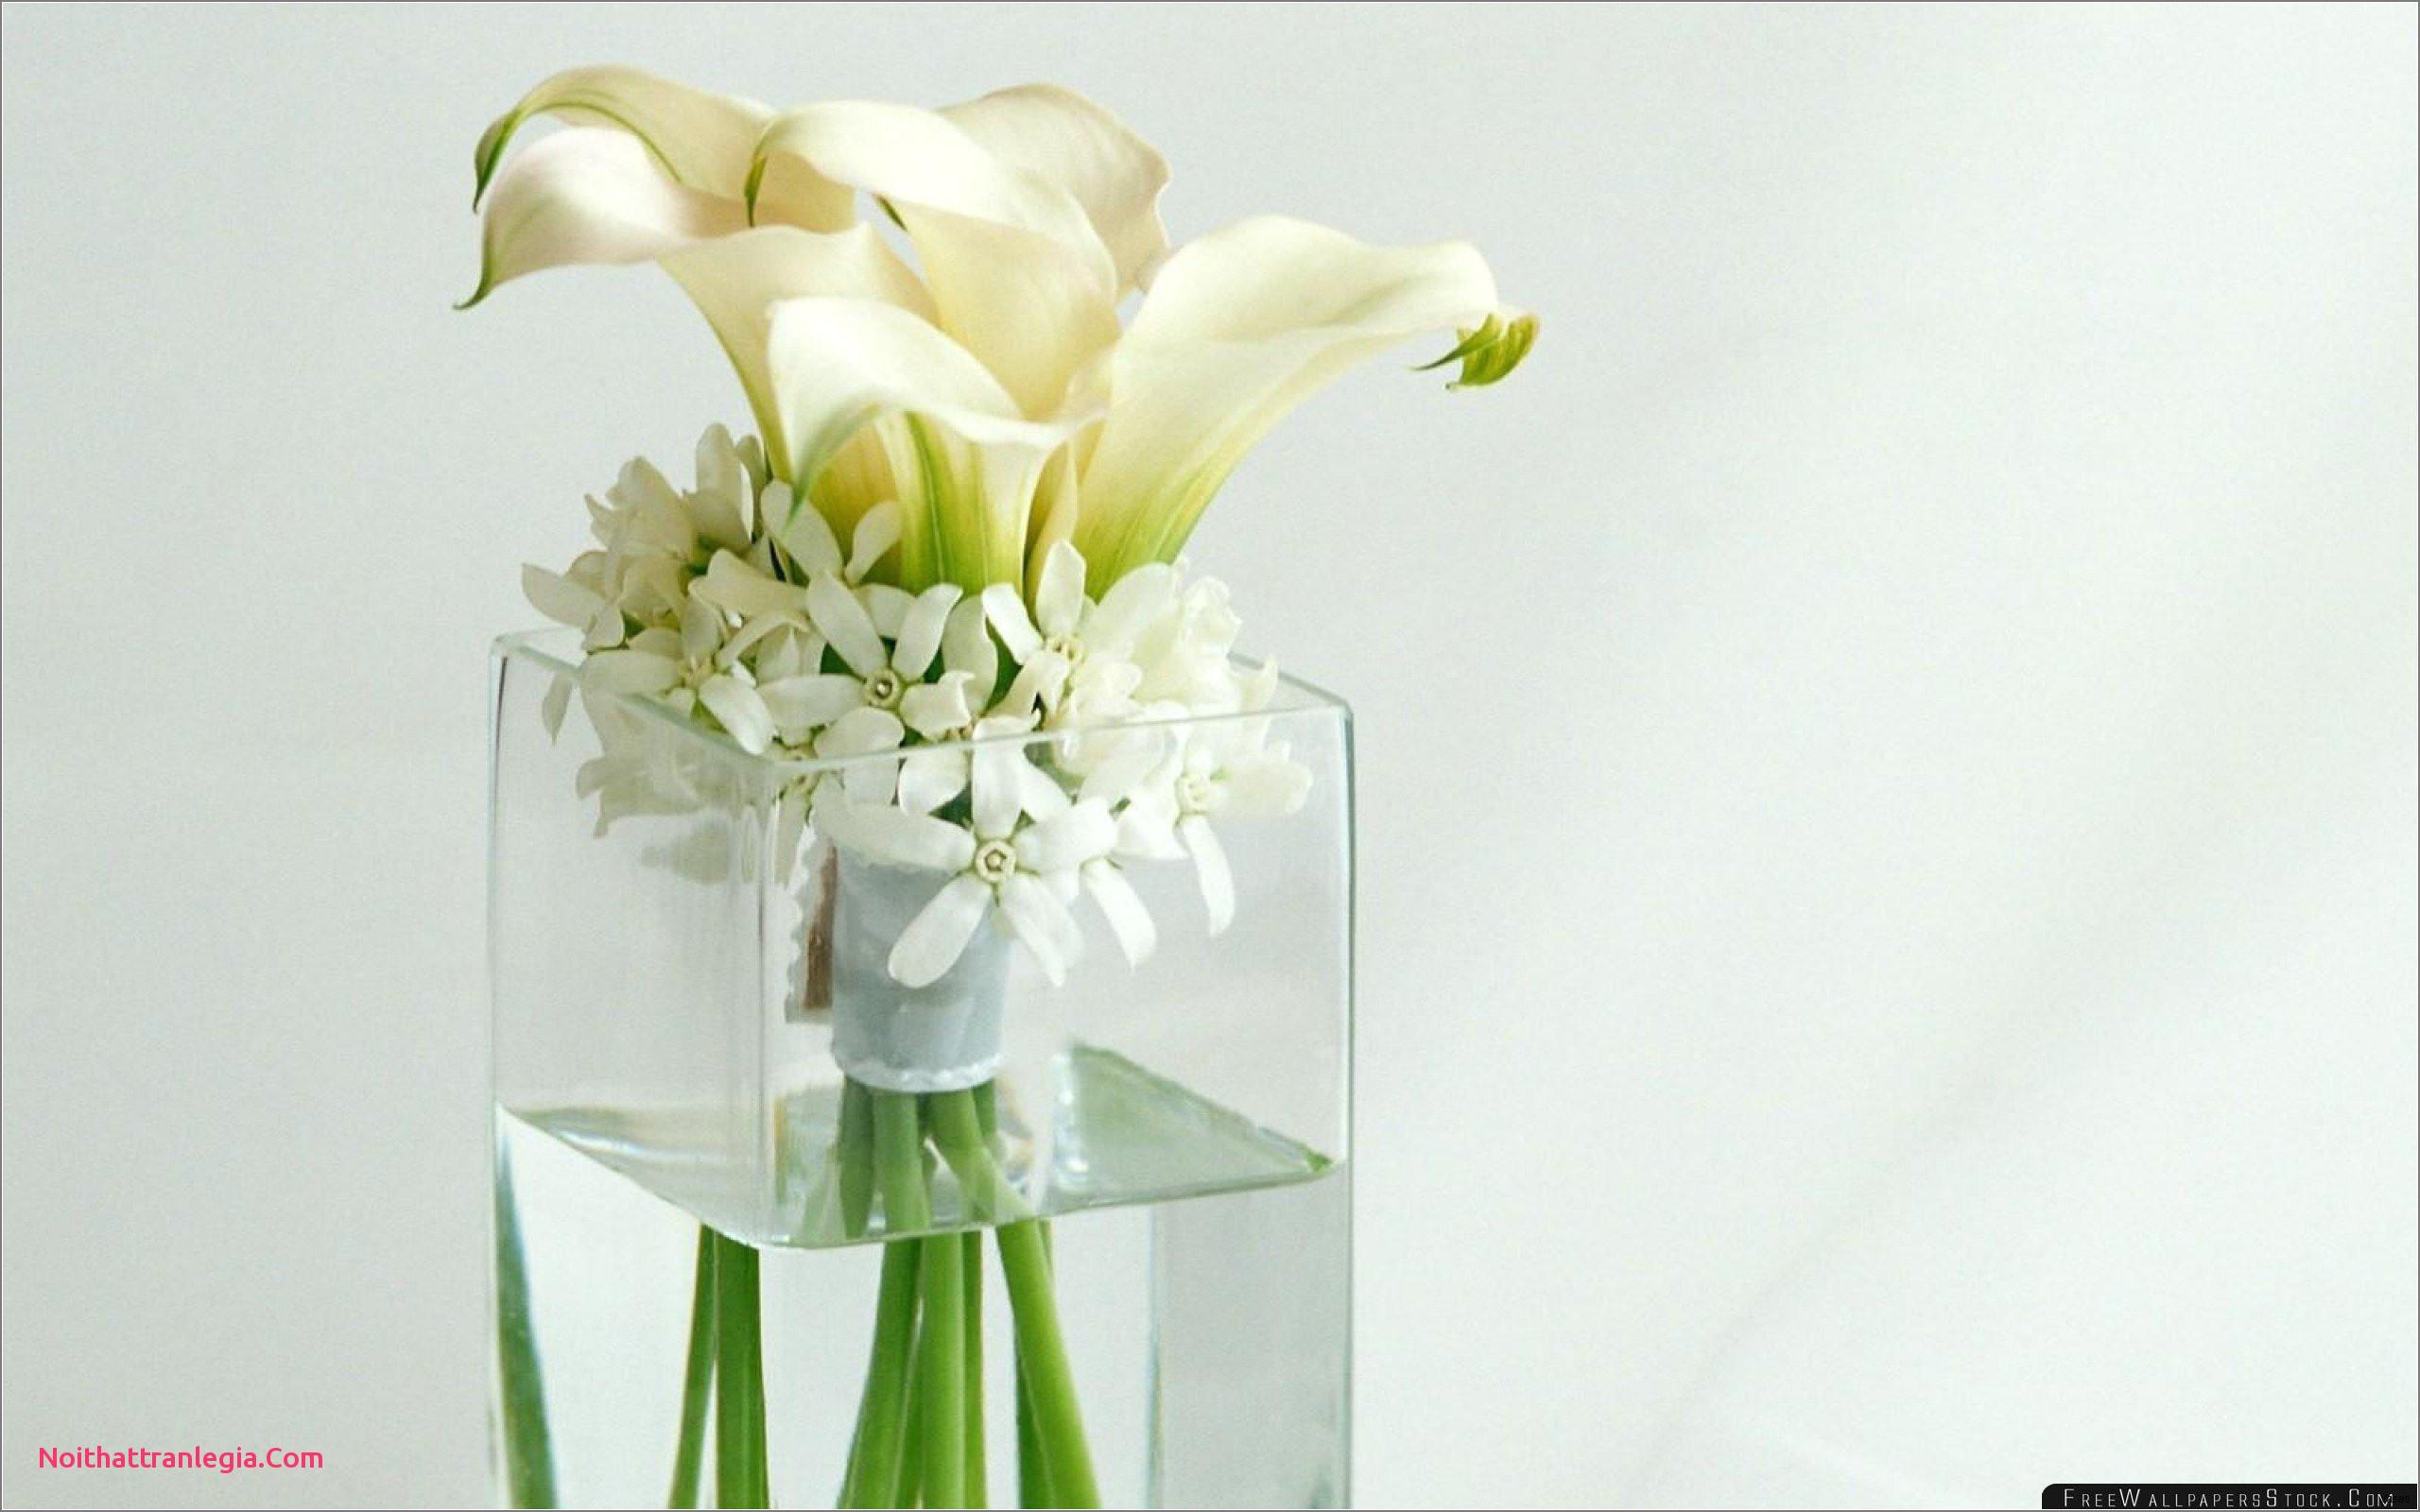 white vases for sale of 20 wedding vases noithattranlegia vases design within wedding petals amazing tall vase centerpiece ideas vases flowers in water 0d artificial 2560 87